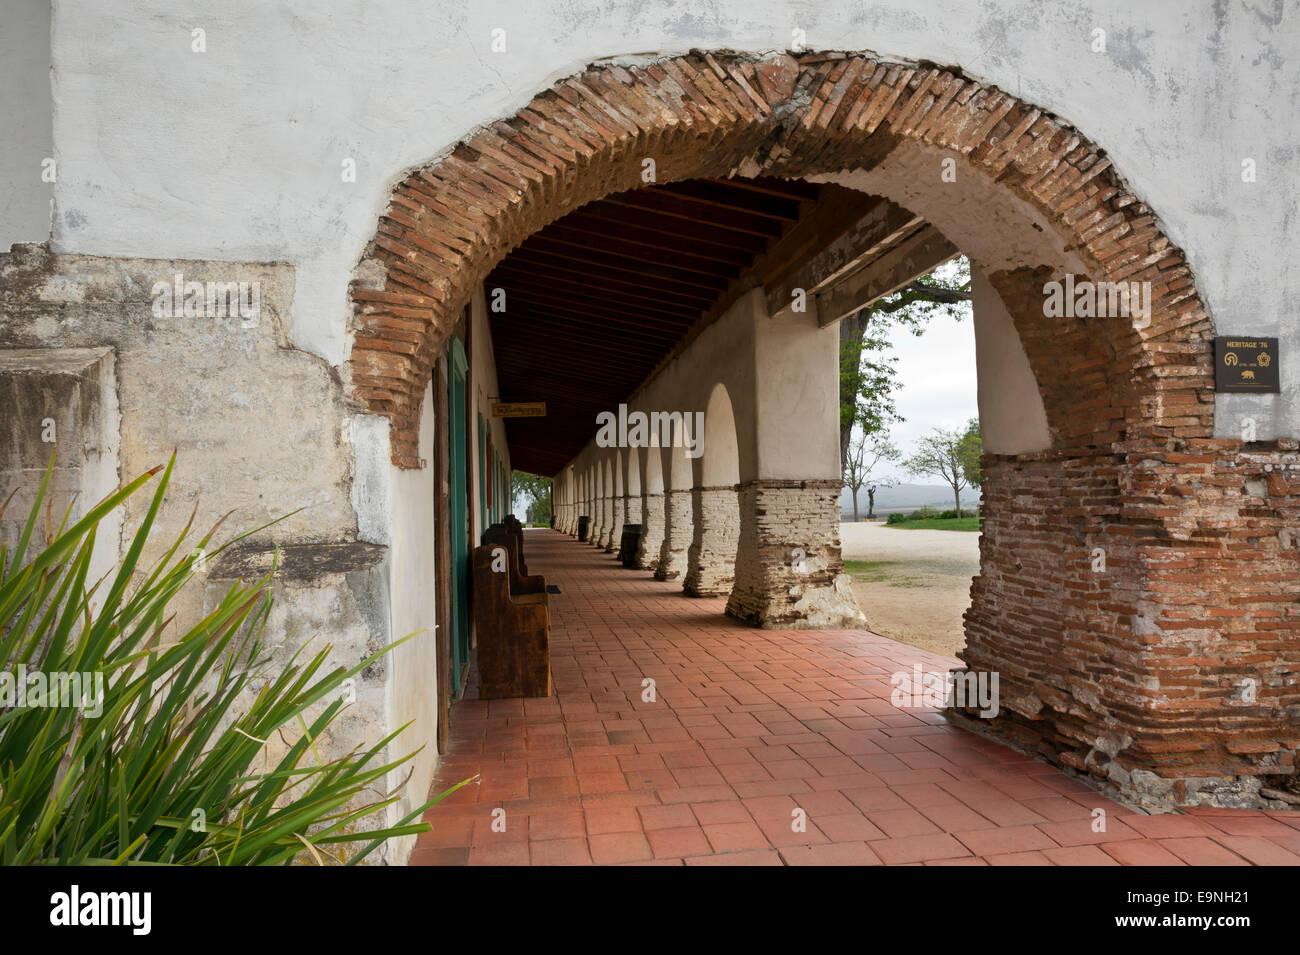 CALIFORNIA - Covered walkway at Mission San Juan Bautista at the San Juan Bautista State Historic Park near Hollister. - Stock Image